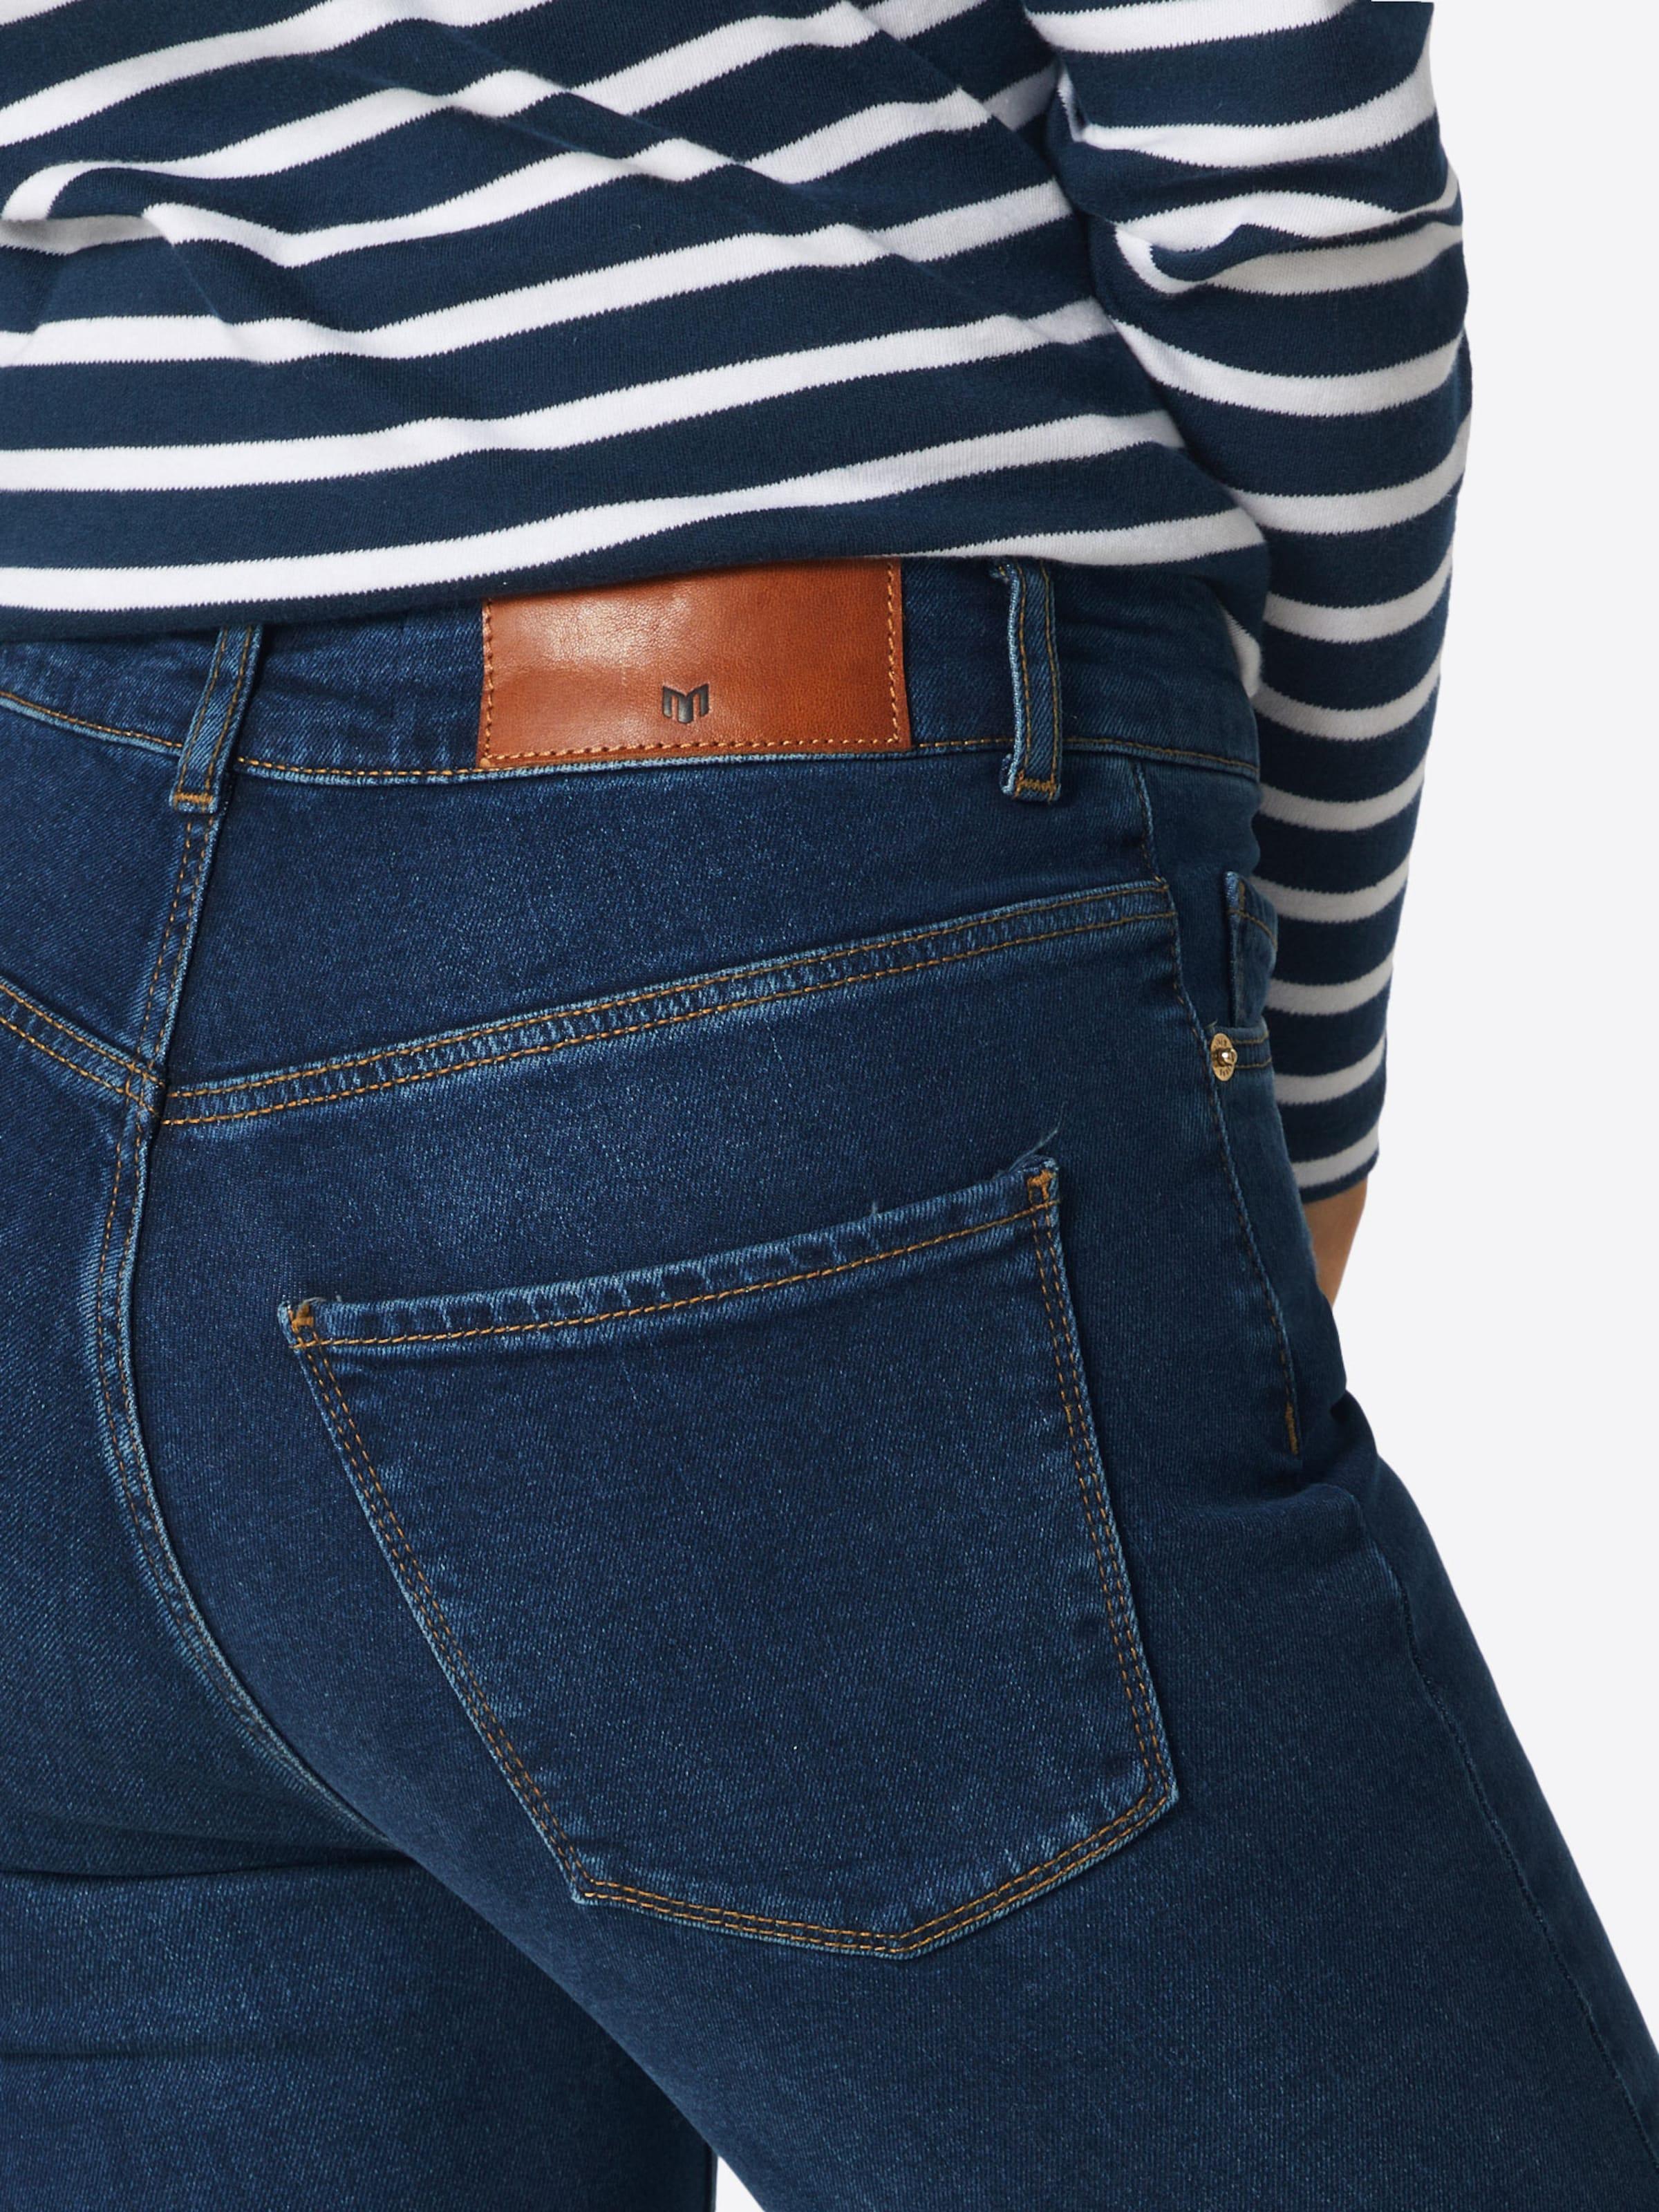 Minimum Bleu Minimum Minimum Jean En Bleu Jean En En Denim Denim Jean Bleu dxBrCtshQ